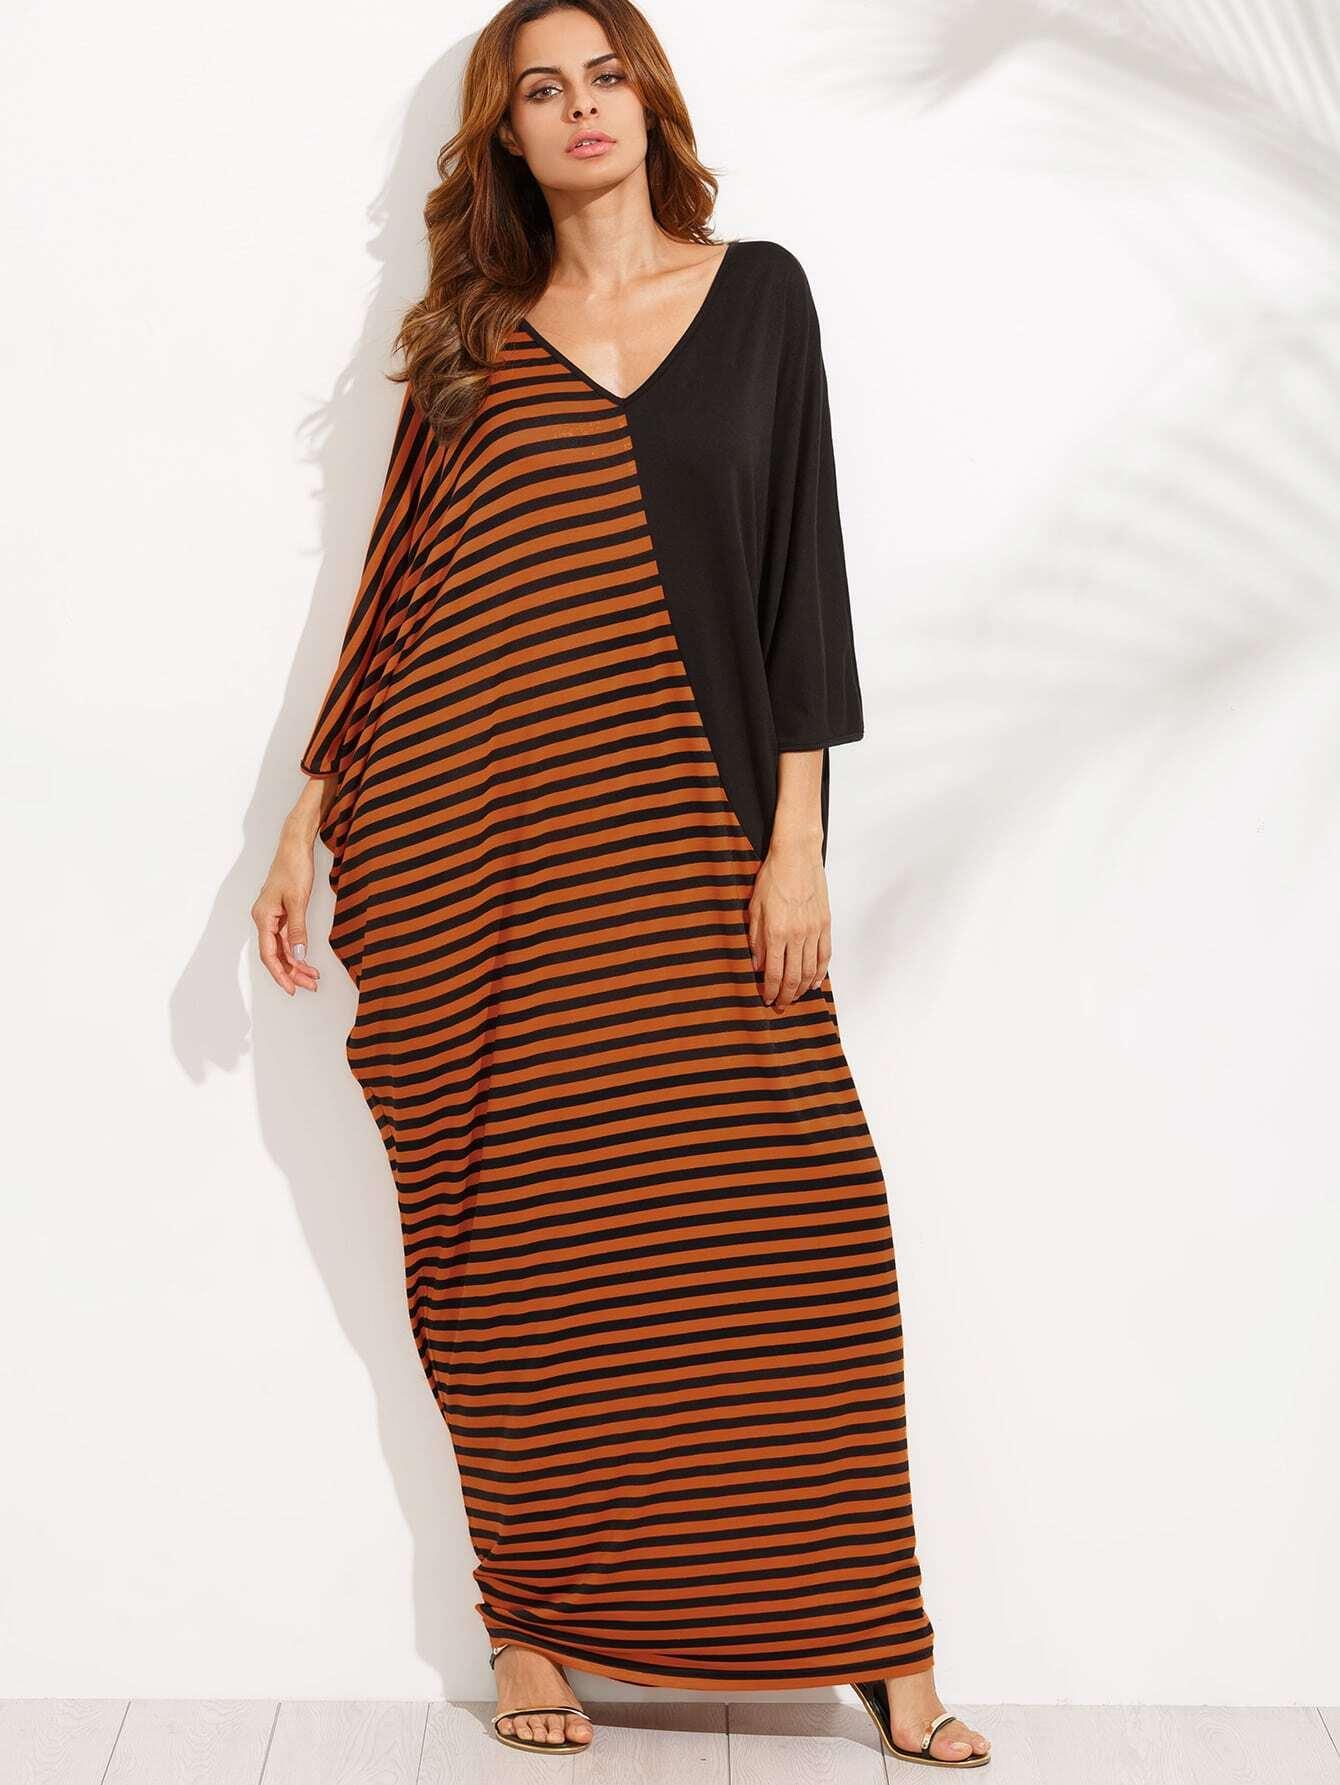 Double V-cut Color Block Dolman Sleeve Full Length Dress напольная акустика raidho c 4 1 piano black